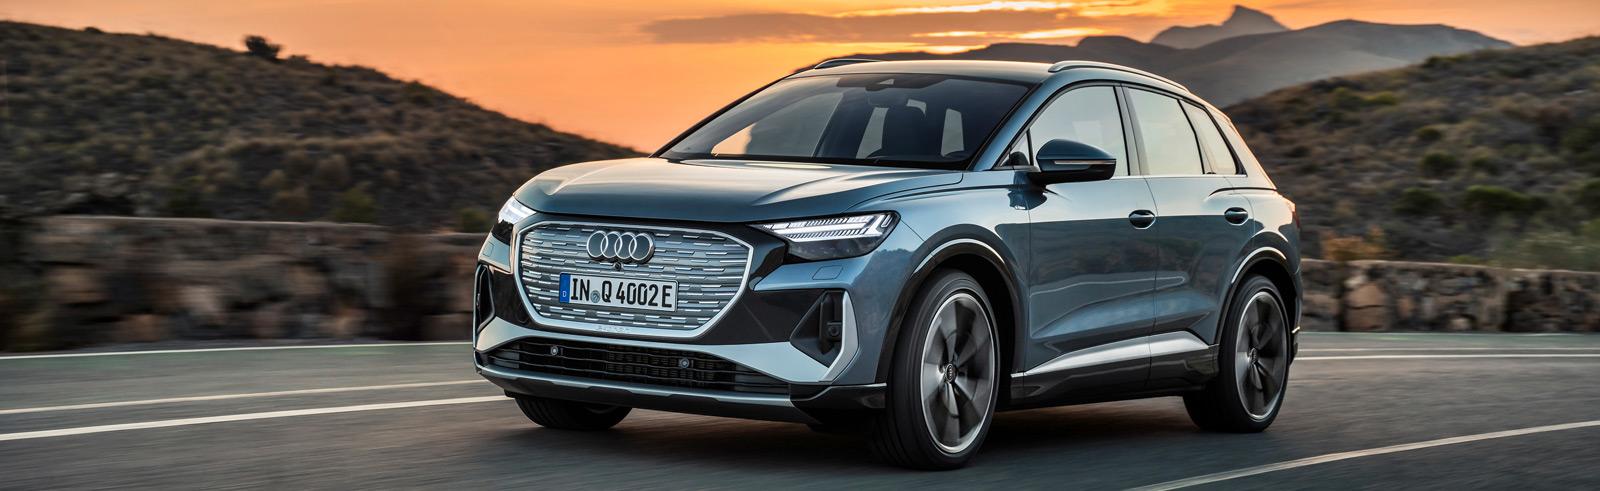 Audi Q4 e-tron and Q4 Sportback e-tron production versions are now official